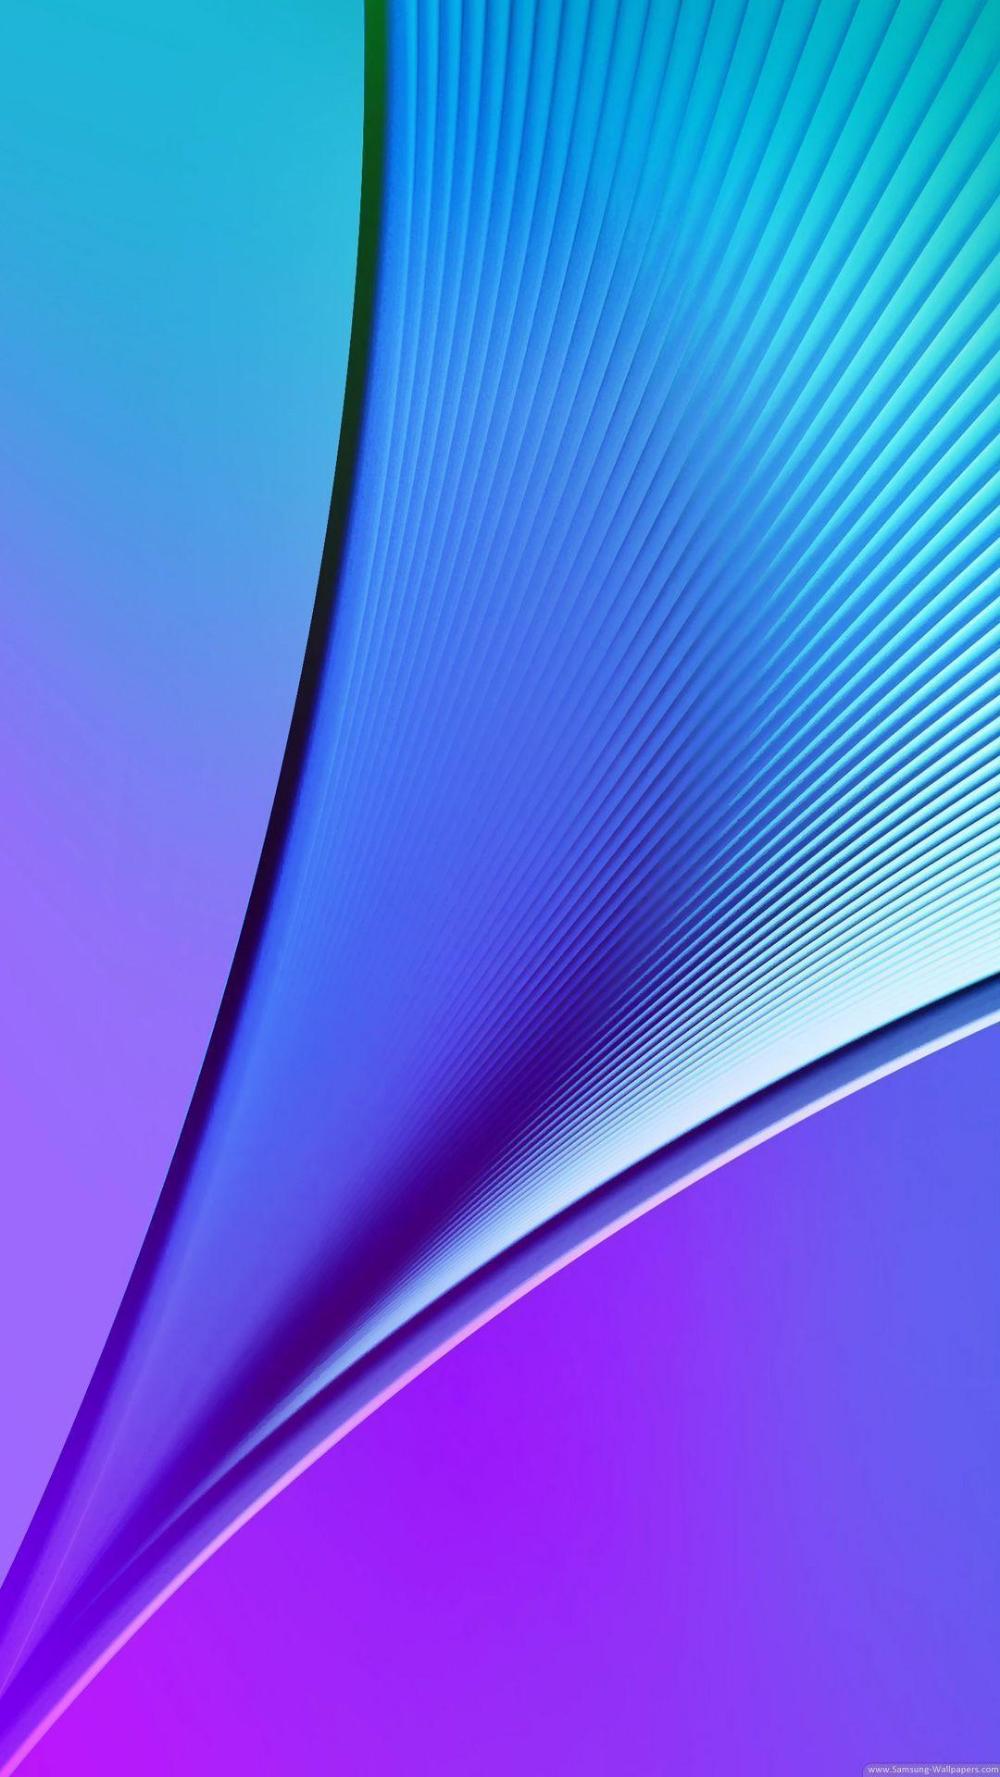 Full Hd Samsung Galaxy J7 Wallpapers Download 2 Wallpapers Samsung J7 Hd Wallpaper Down Geometric Wallpaper Iphone Abstract Iphone Wallpaper Iphone Wallpaper